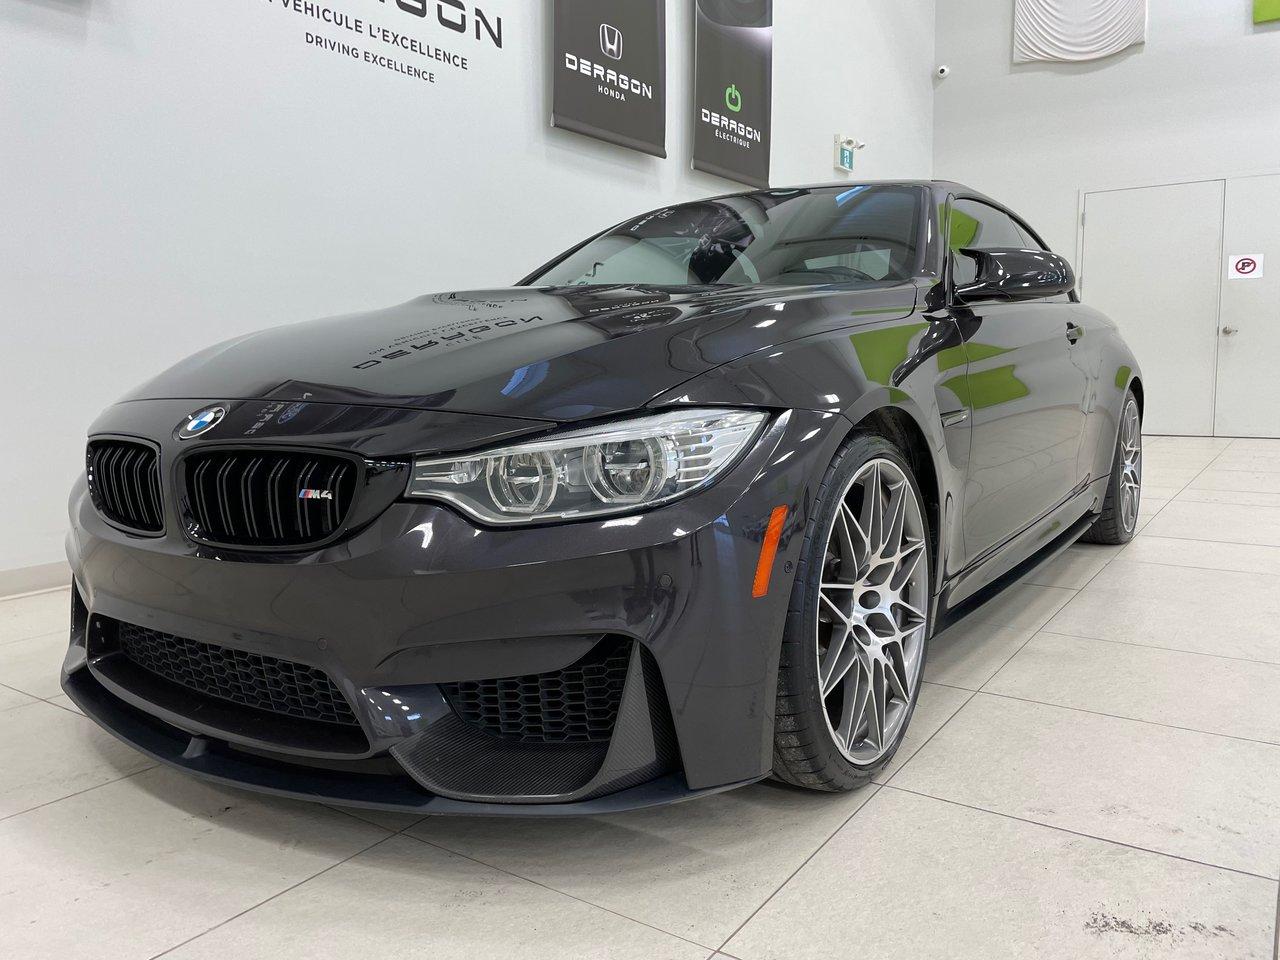 BMW Série 4 M 2017 COMPETITION, CONVERTIBLE, CARBON, EXHAUST